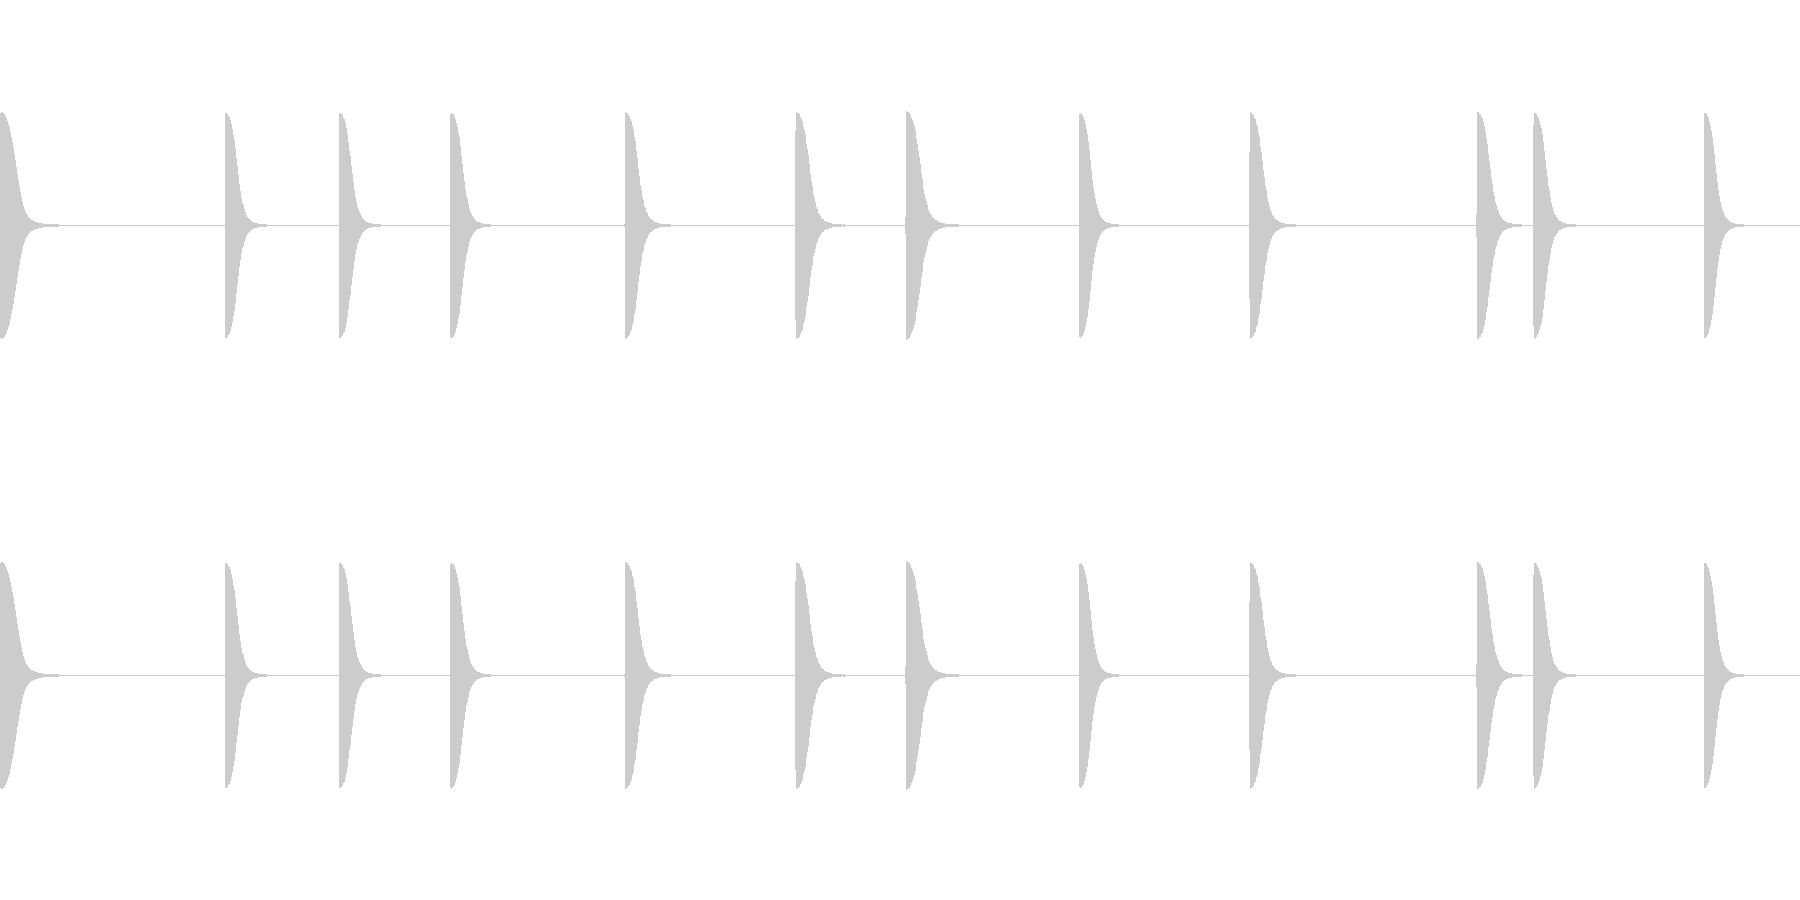 EDM PluckLoop4 Dry音の未再生の波形